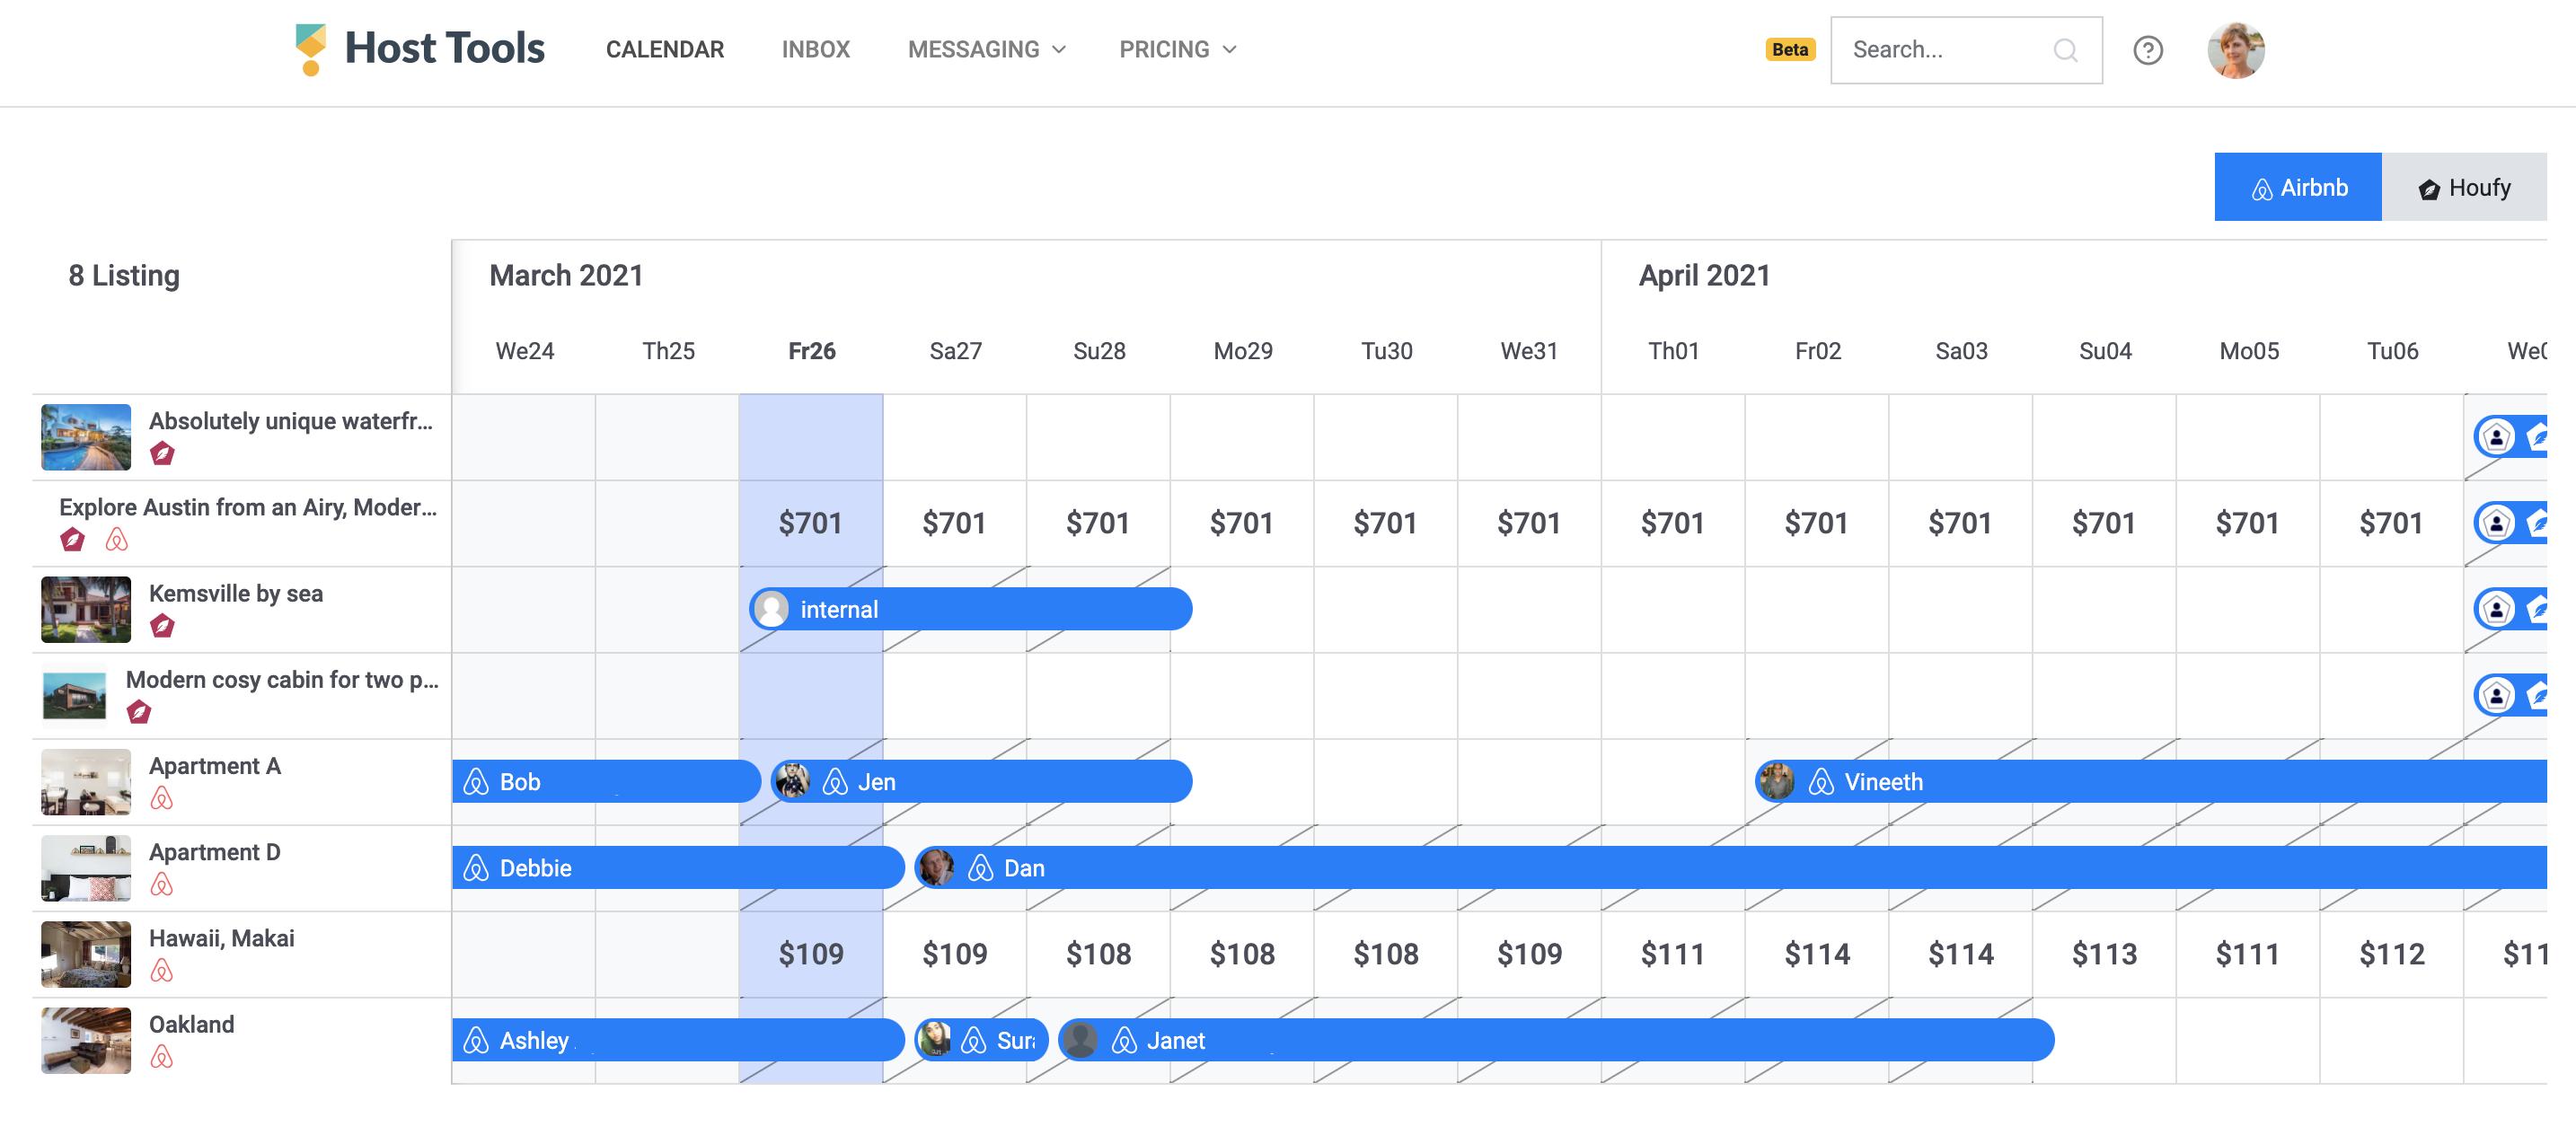 Preview of Host Tools multi-calendar.